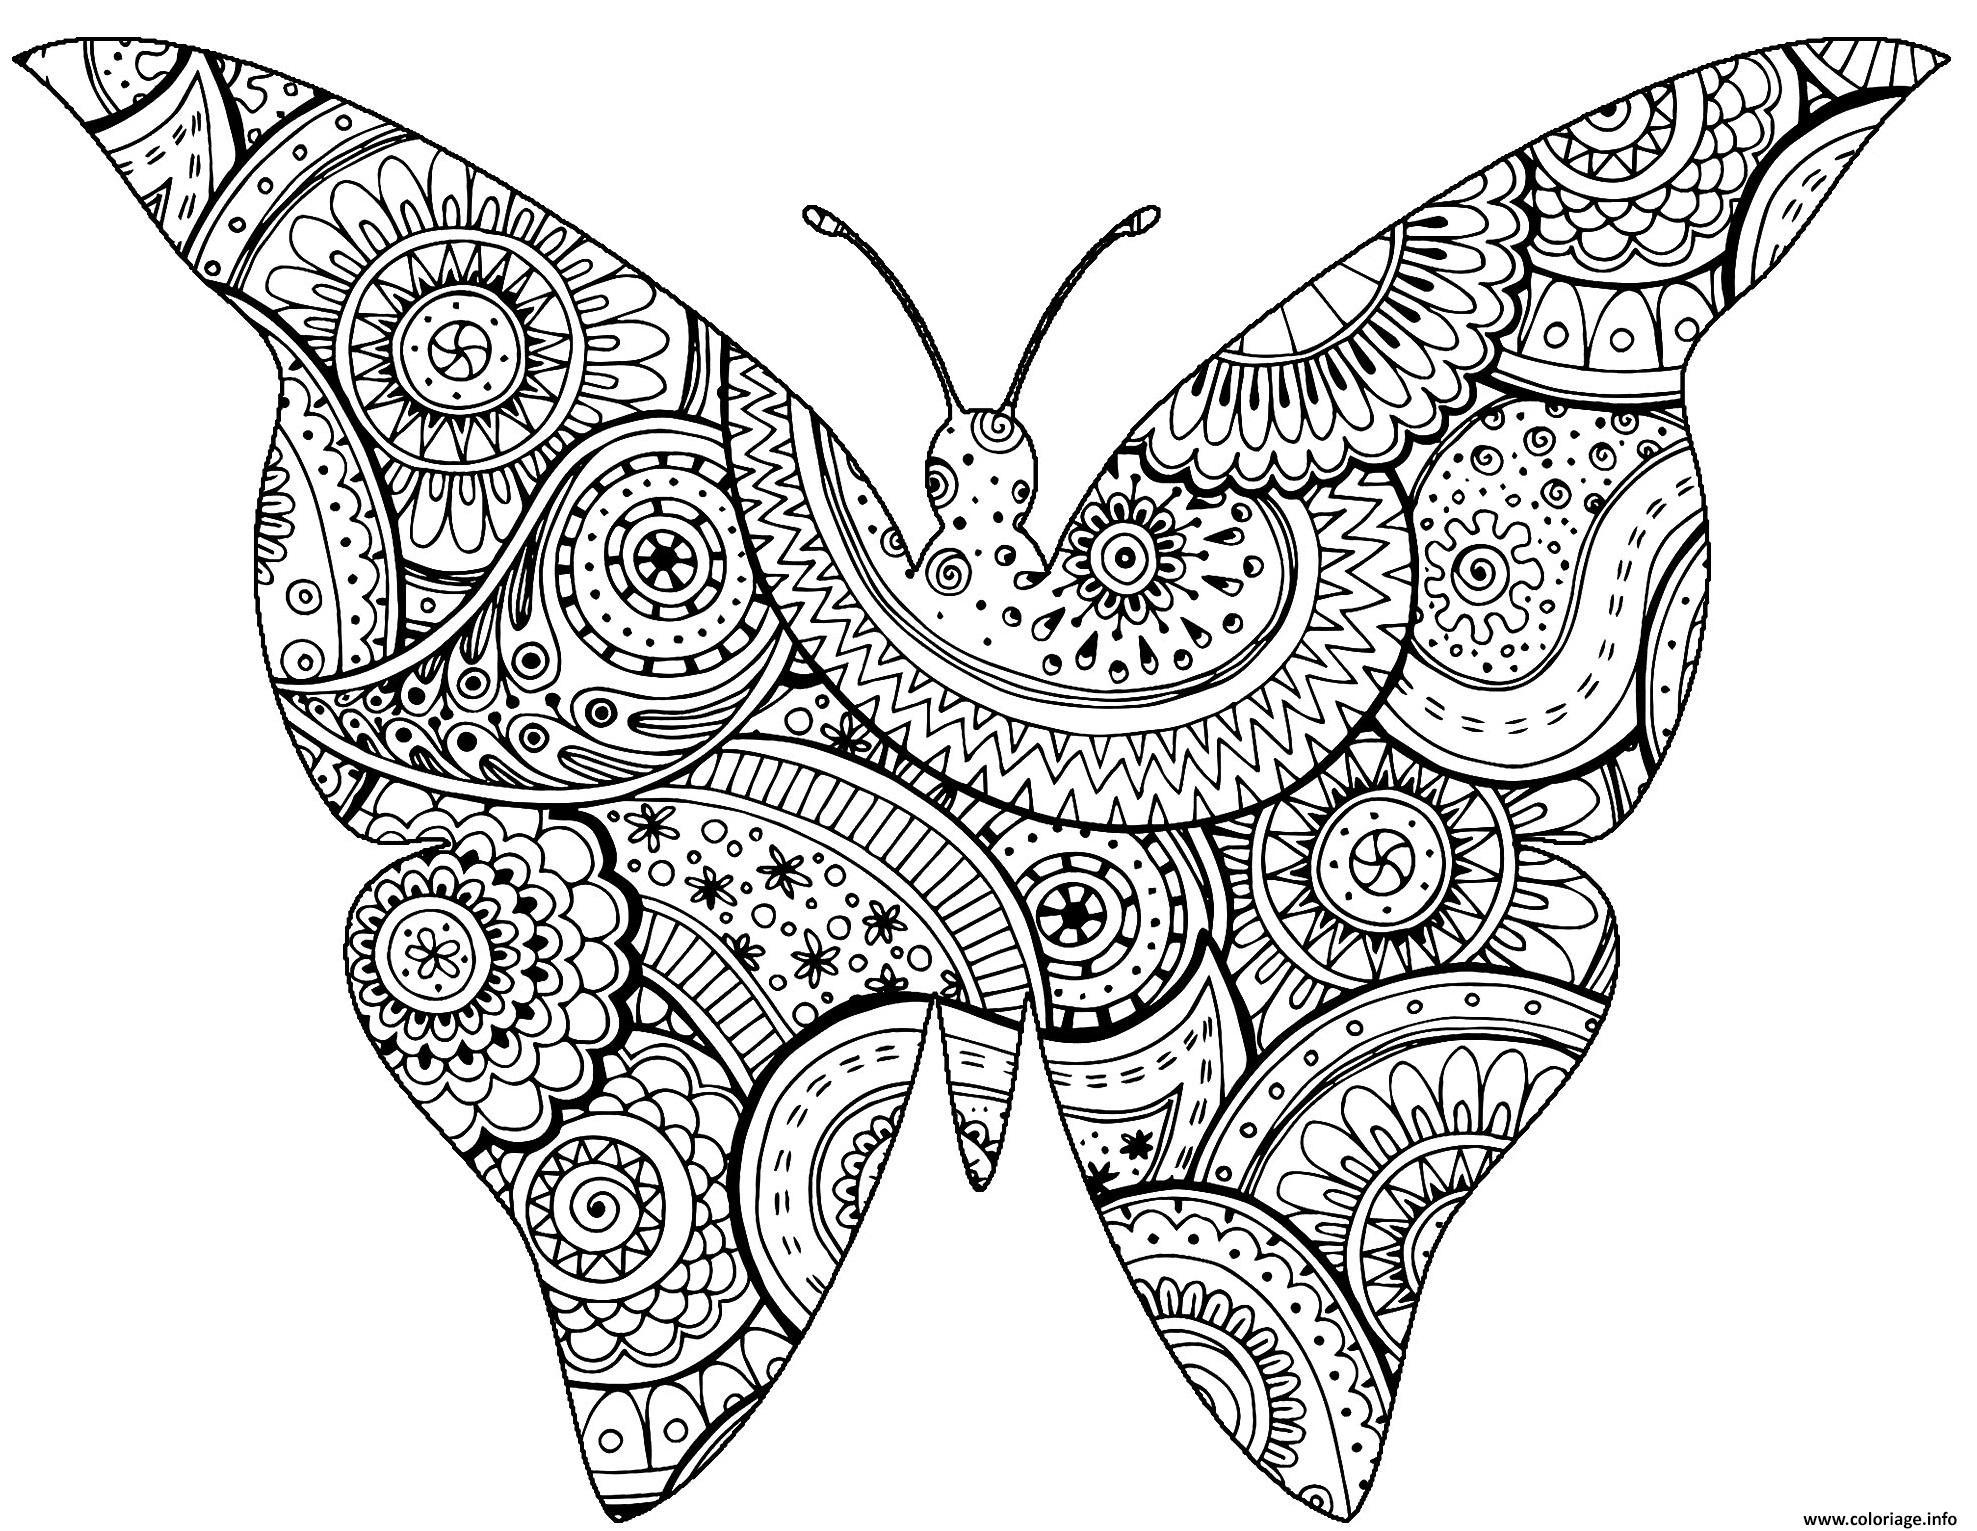 Dessin A Imprimer Papillon Gratuit - PrimaNYC.com